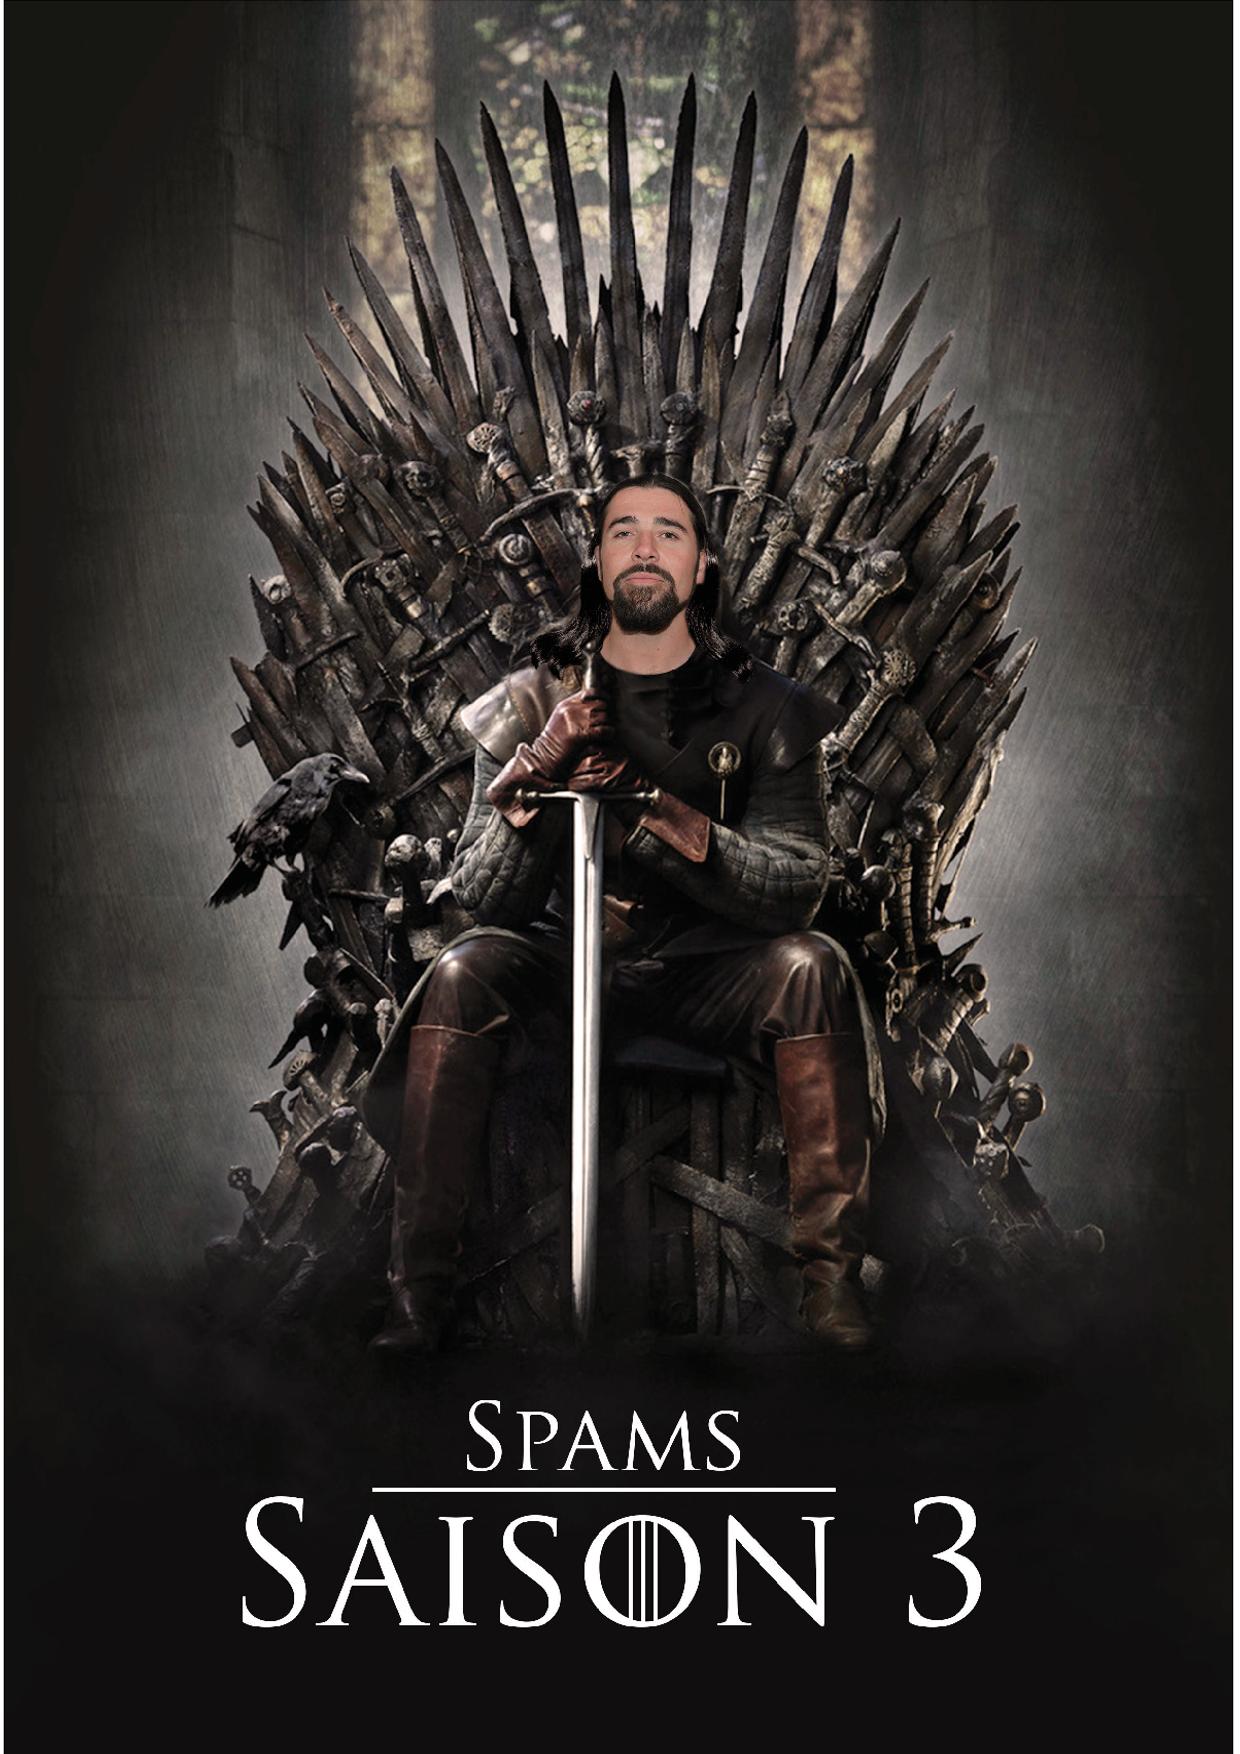 Spams Loïc Game of Thrones